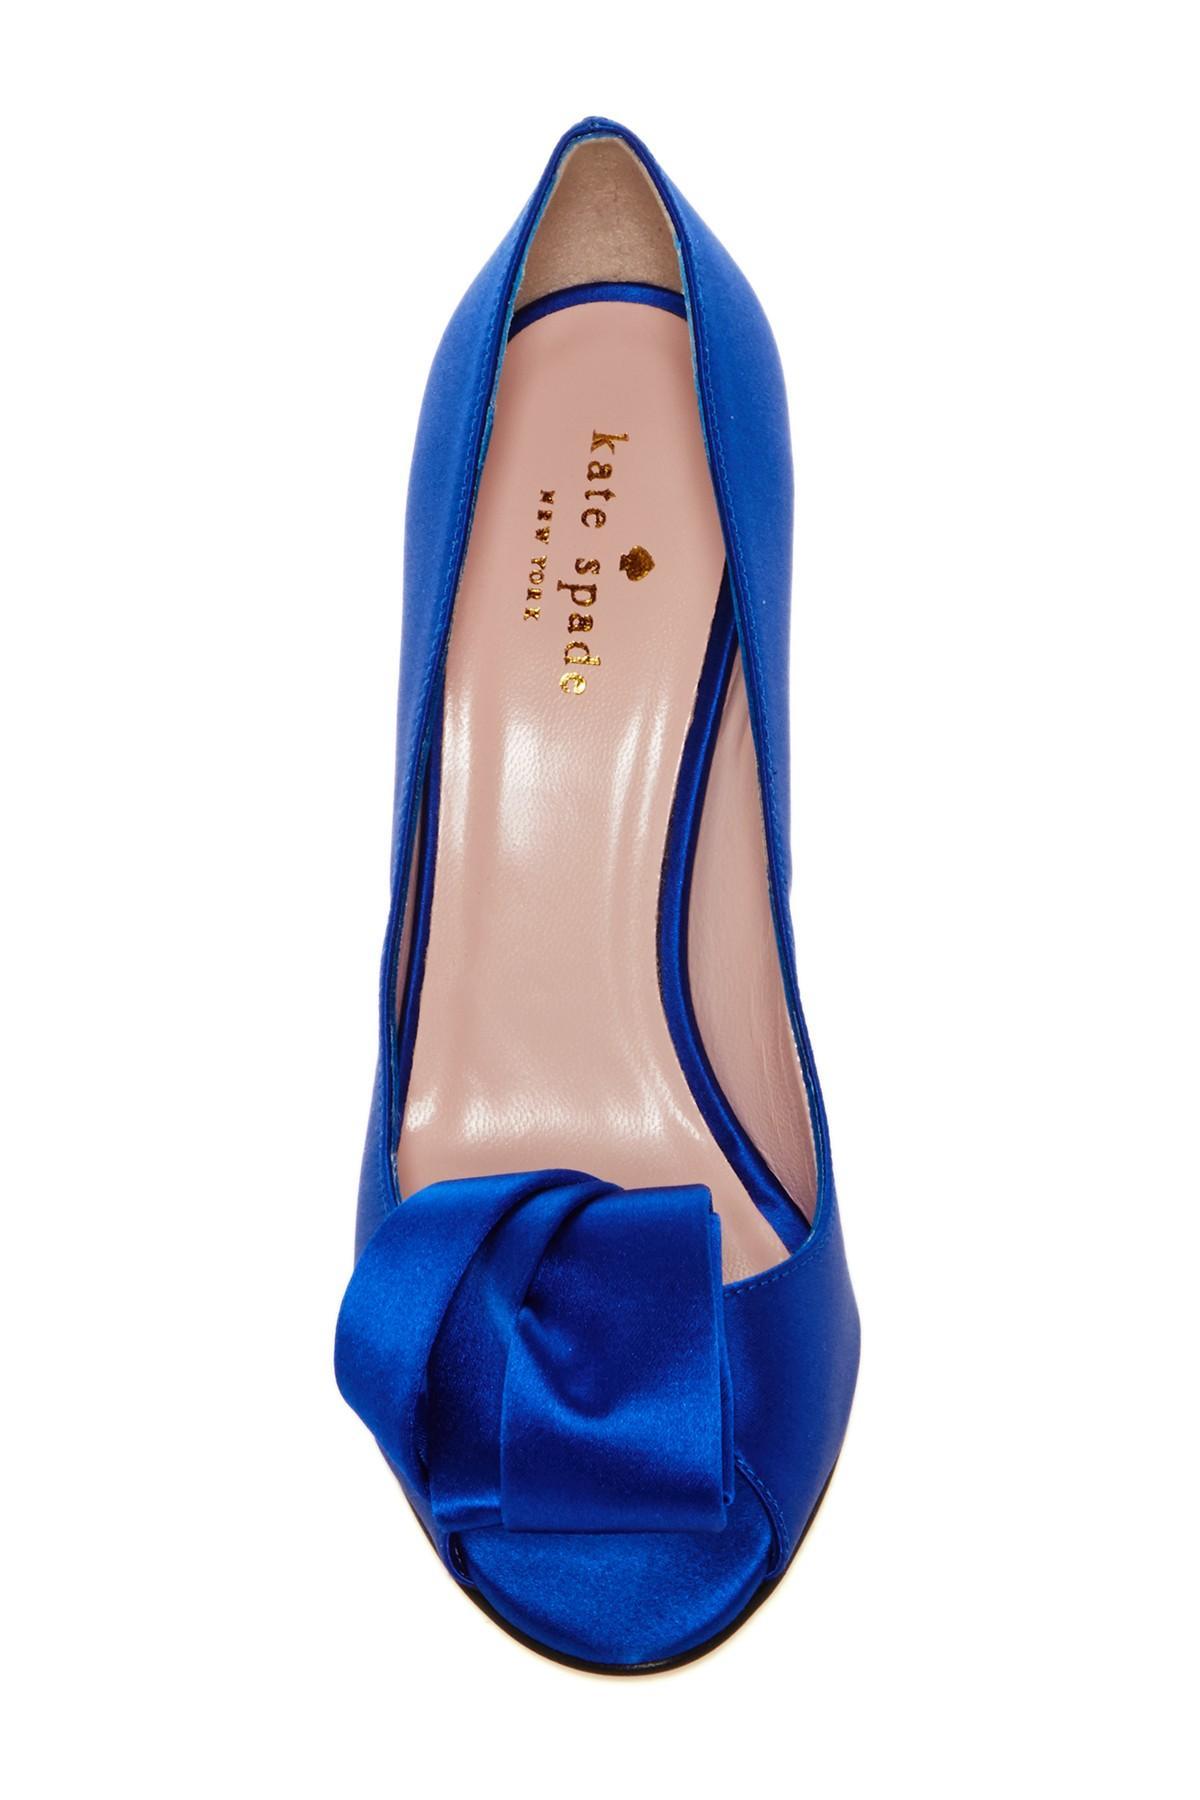 Kate Spade Cobalt Blue Shoes